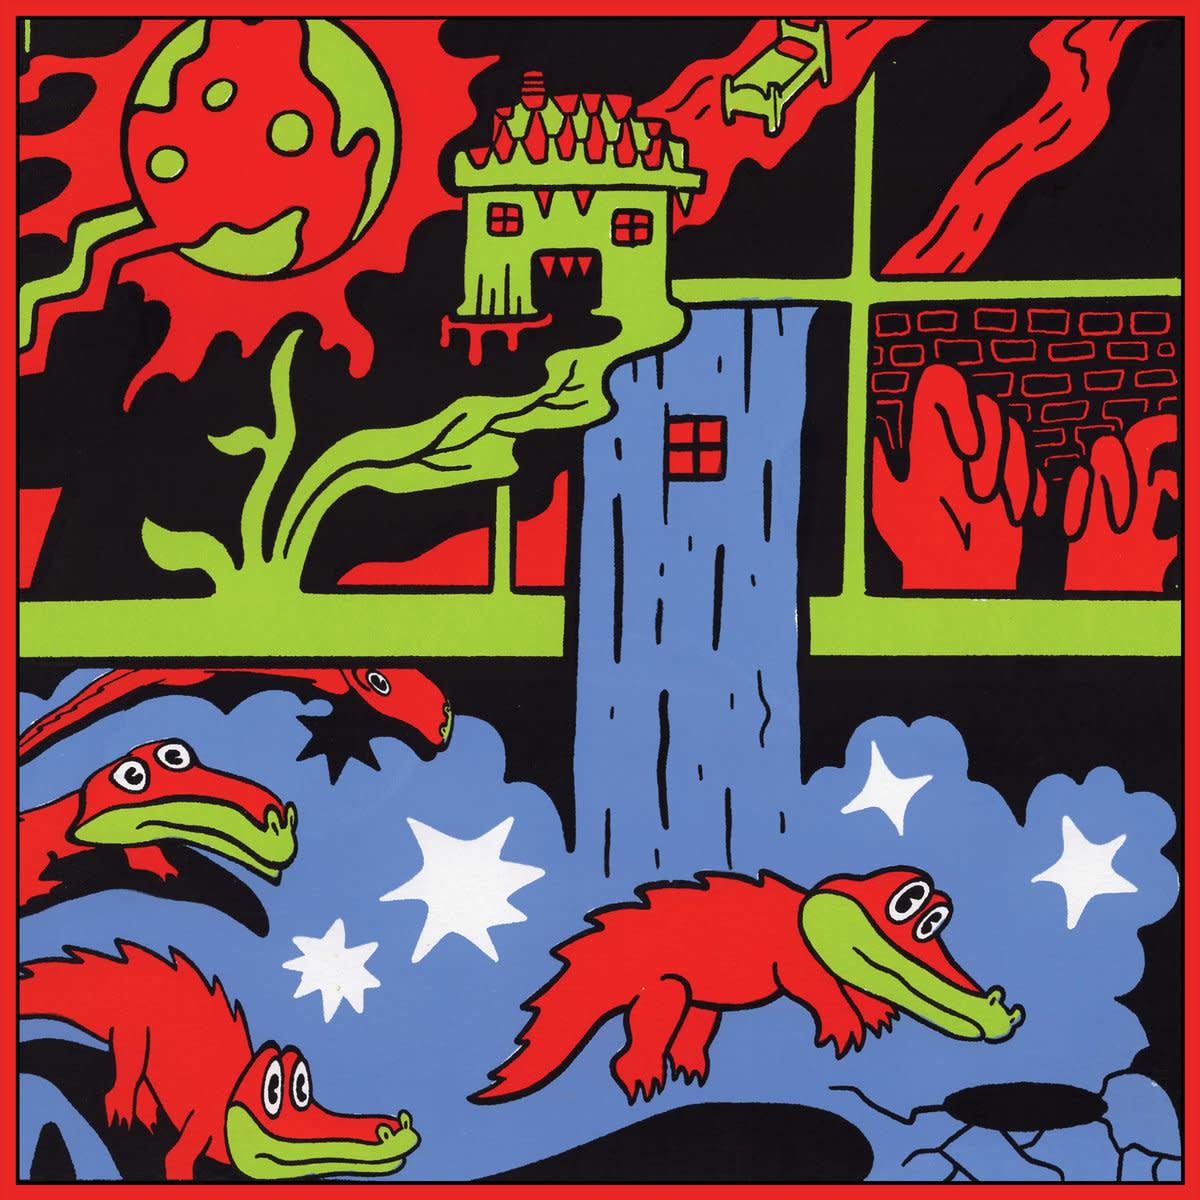 Gizz's Picks King Gizzard & The Lizard Wizard - Live In Paris 2019 (Coloured Vinyl)